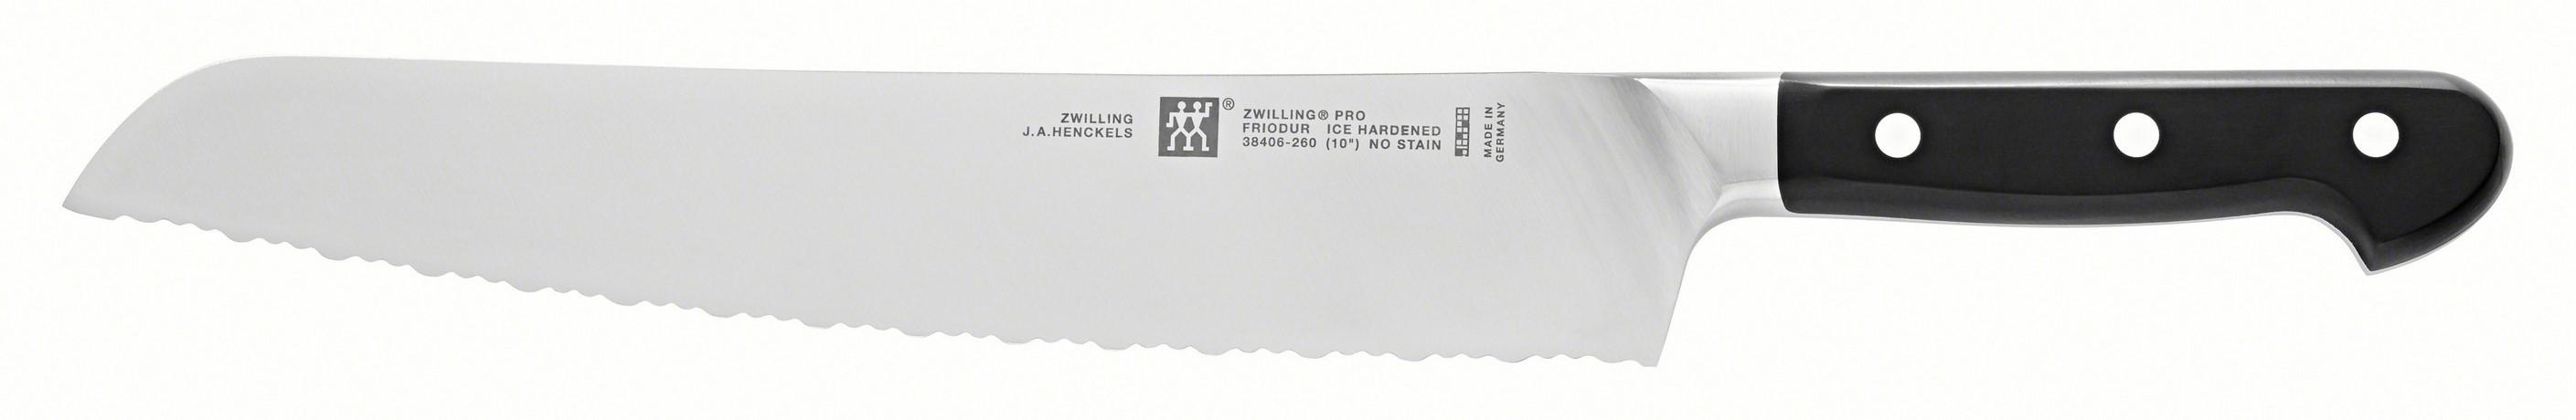 Buy this Henckel Pro bread knife online at smithsofloughton.com